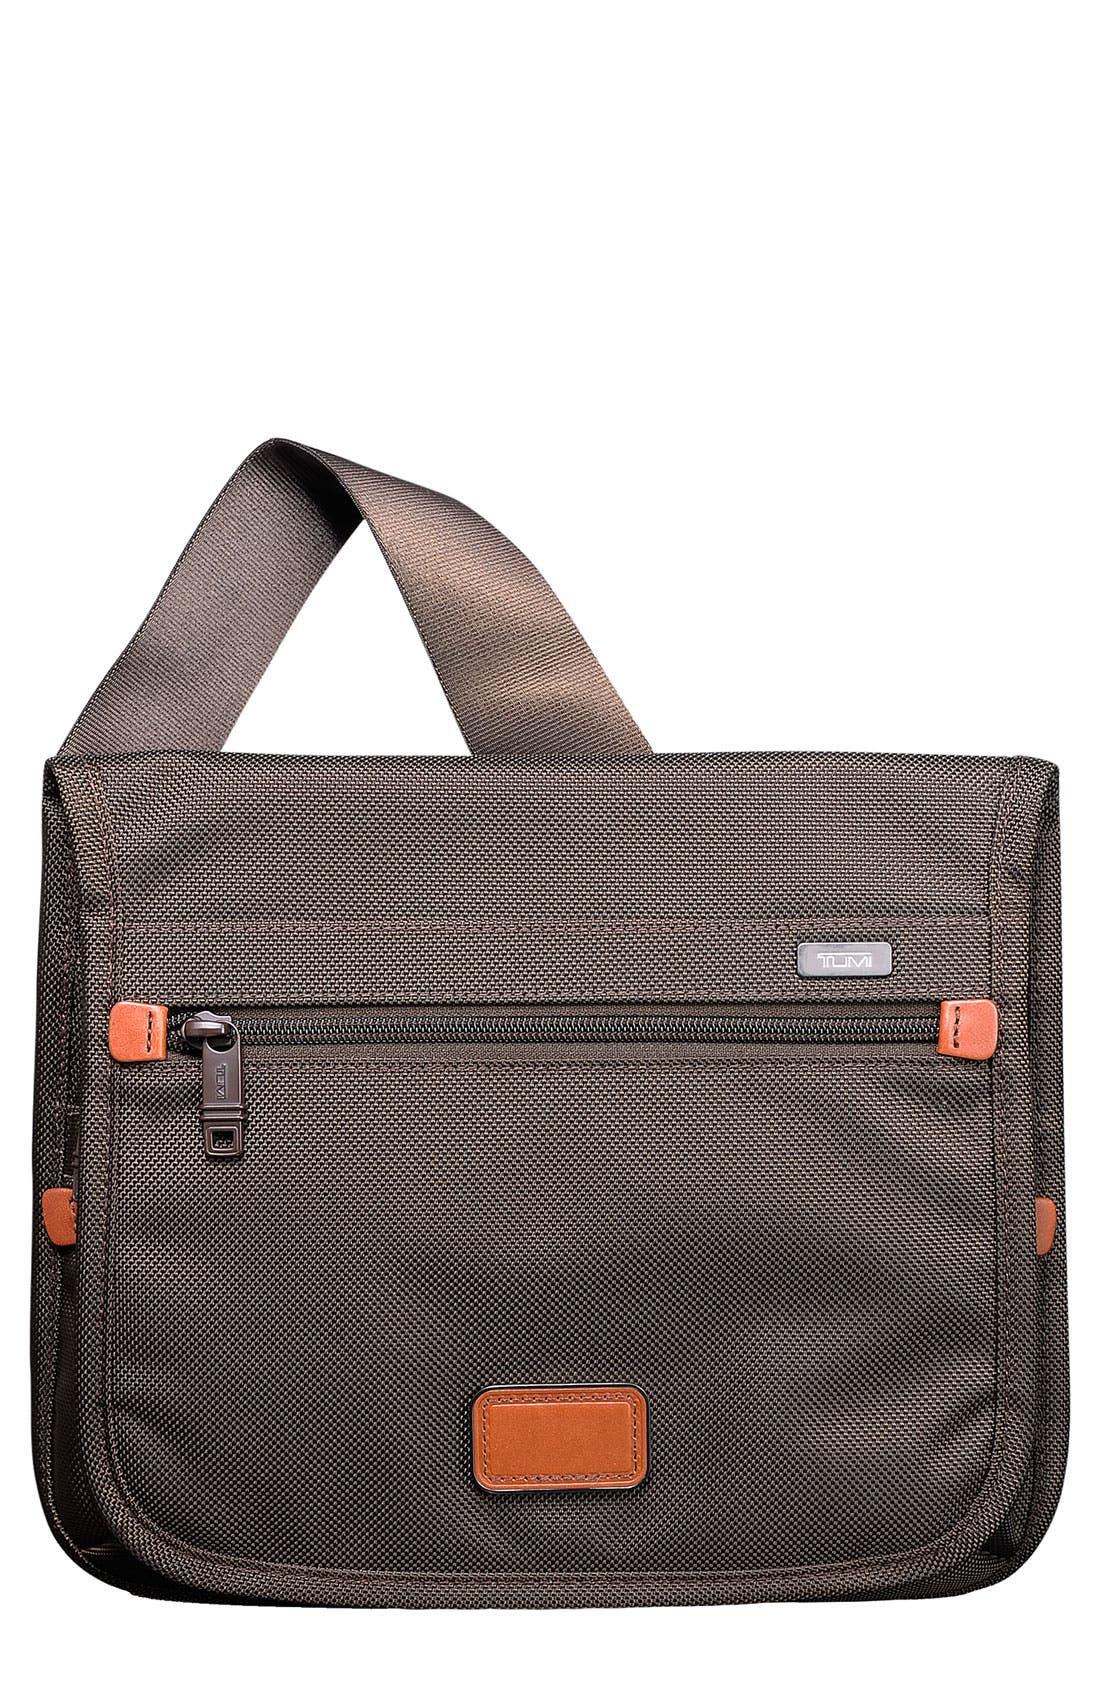 Alternate Image 1 Selected - Tumi 'Small Alpha' Flap Crossbody Bag